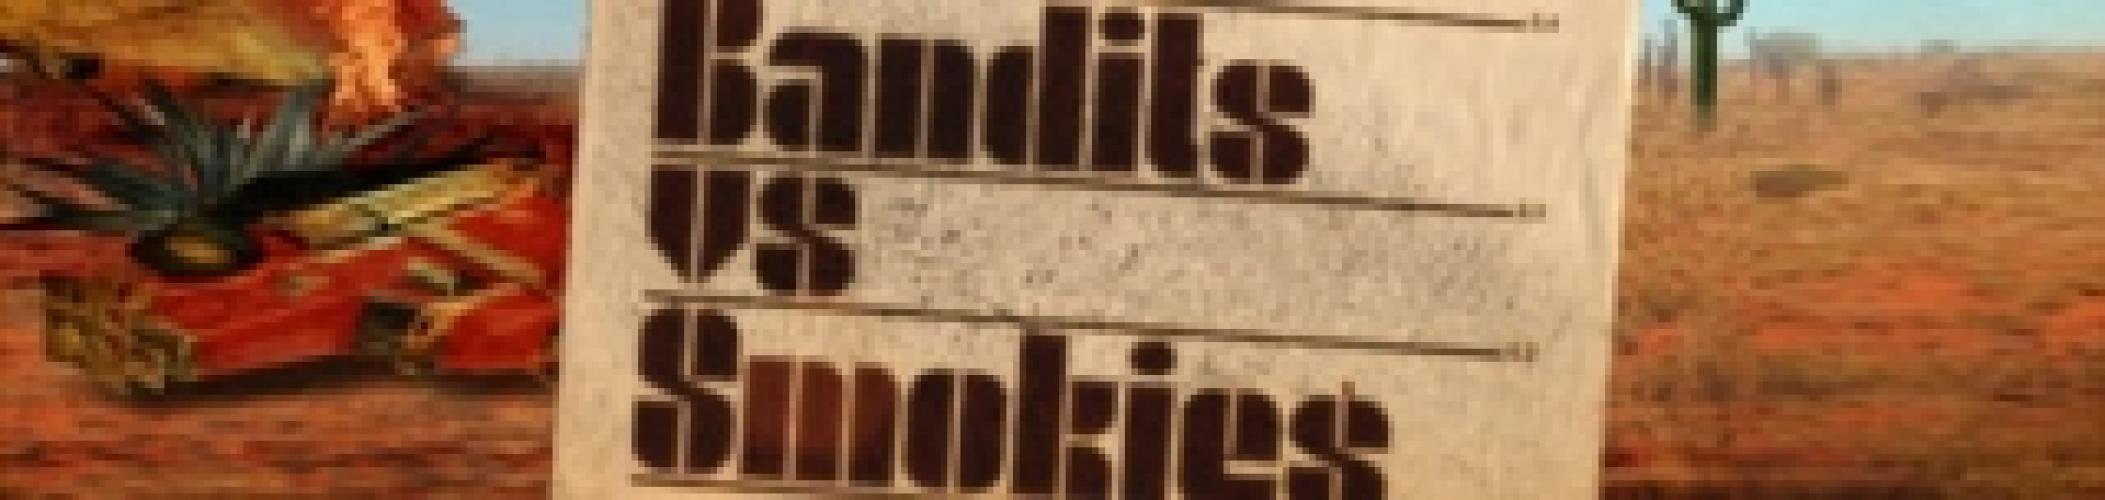 Bandits vs. Smokies next episode air date poster